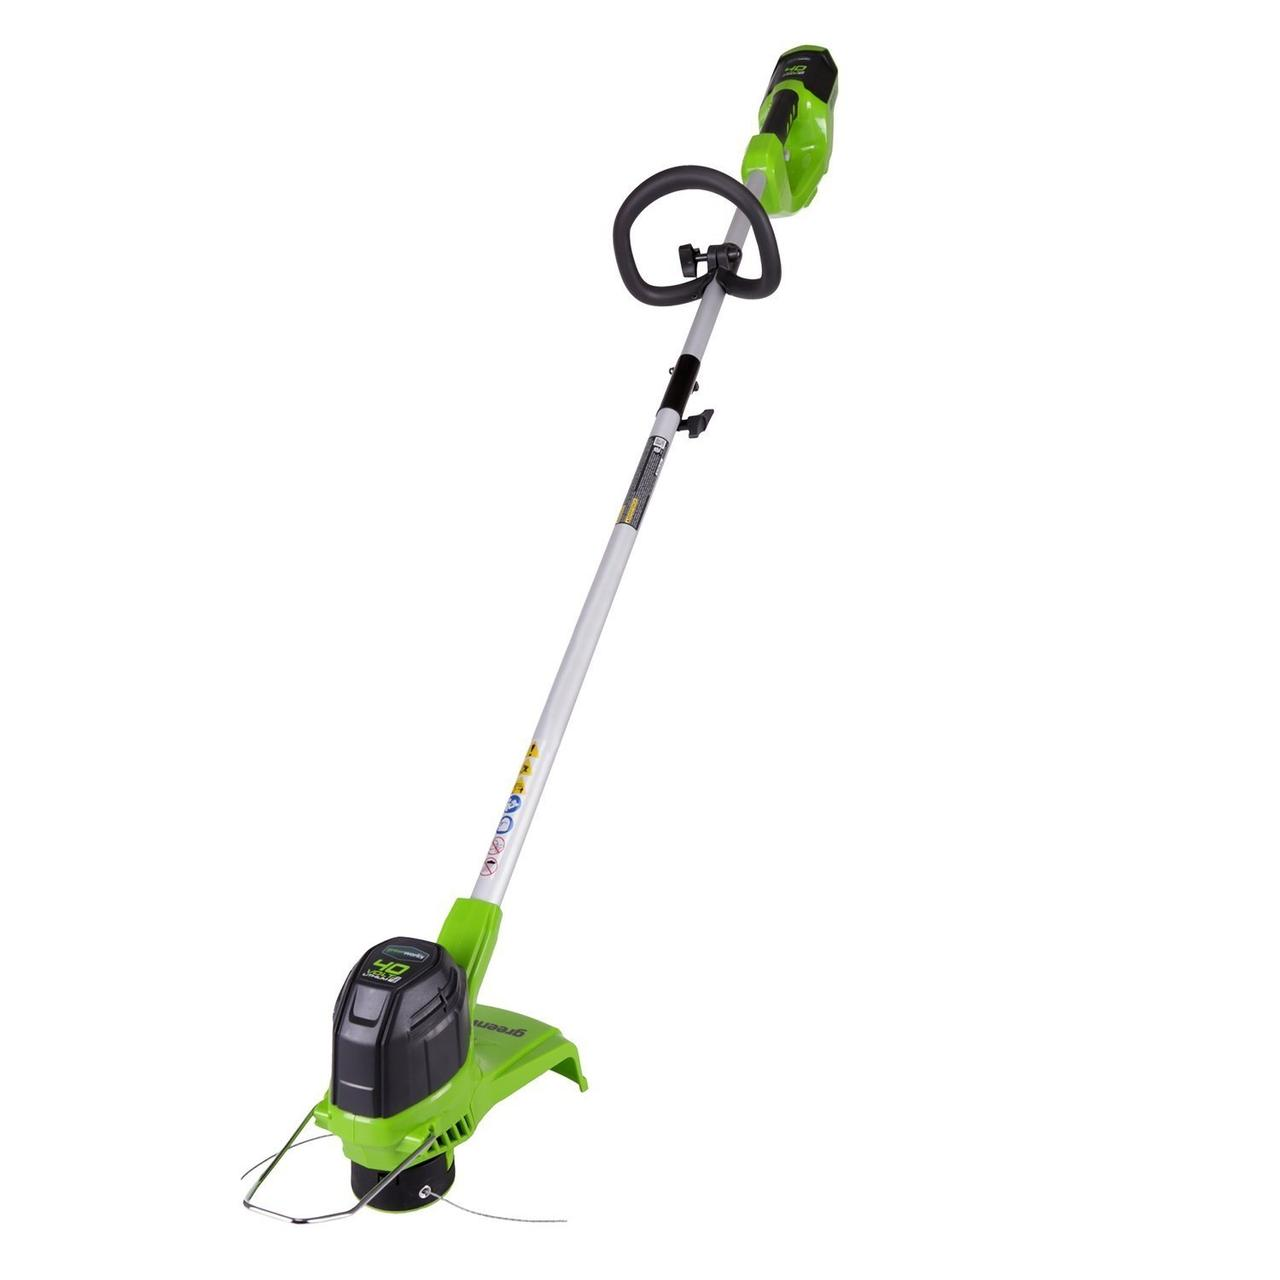 Аккумуляторный триммер для травы 40 V Greenworks G40LT ( BST4000 )